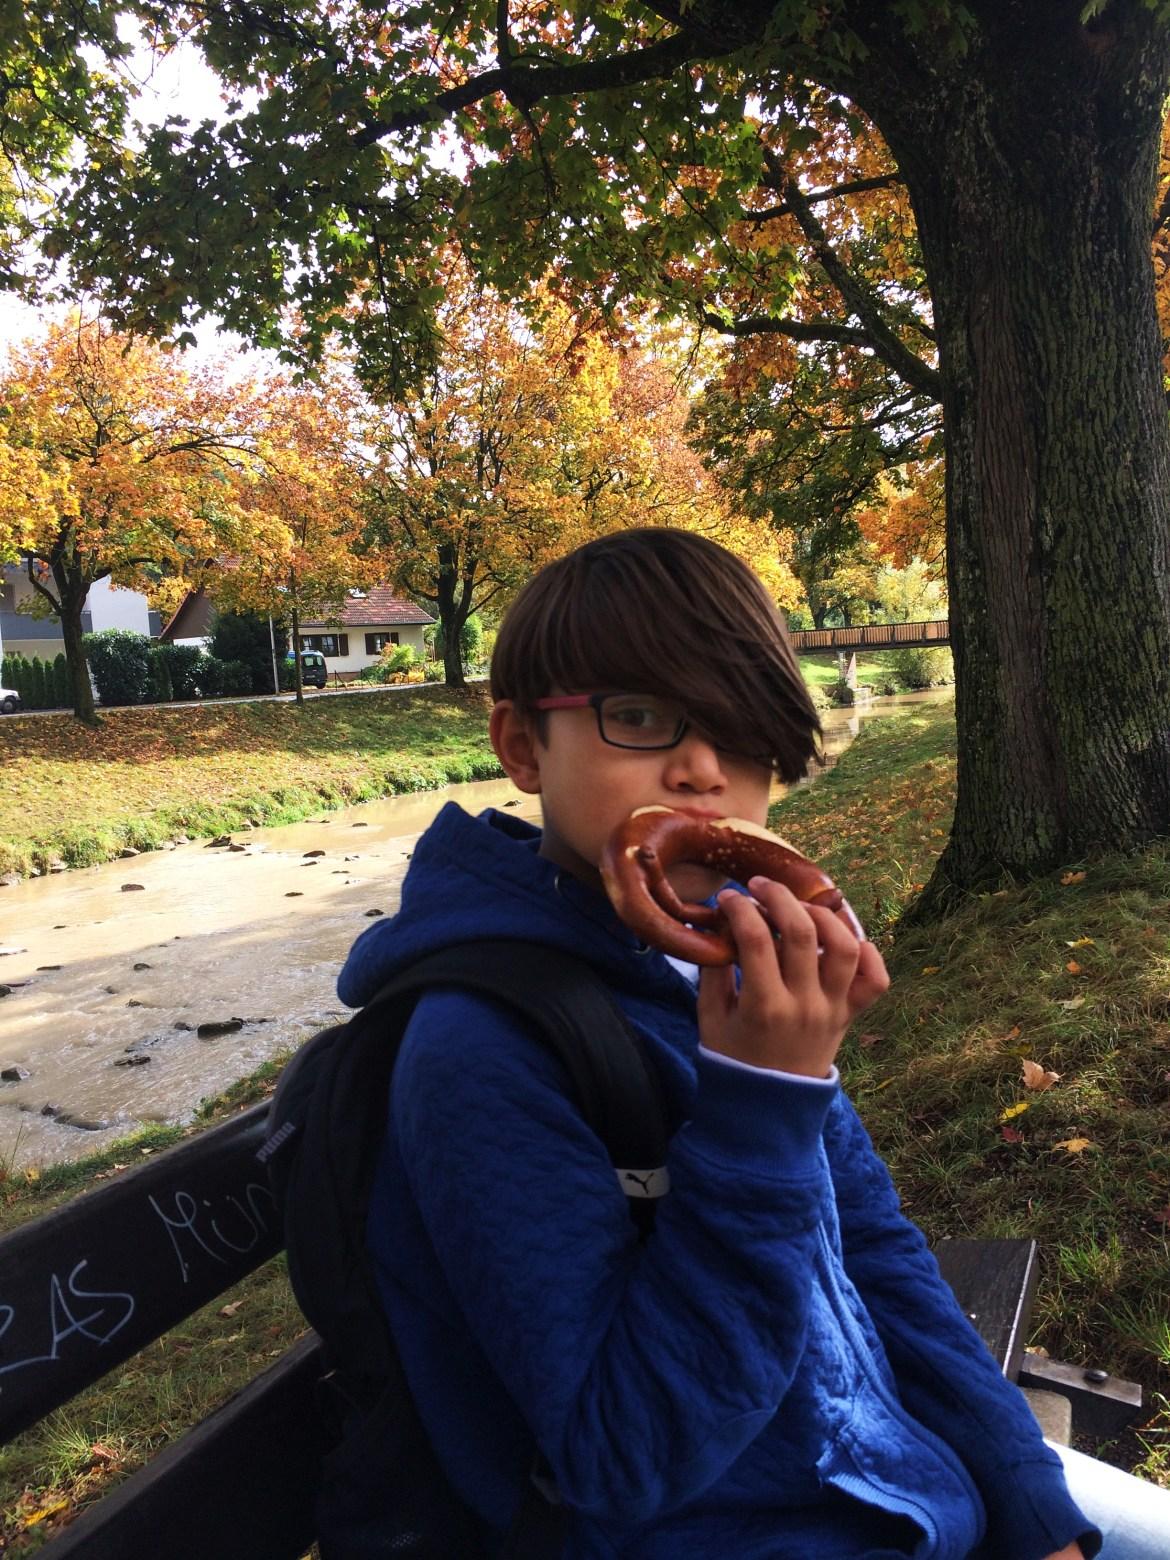 Tubingen, Germany in the Fall